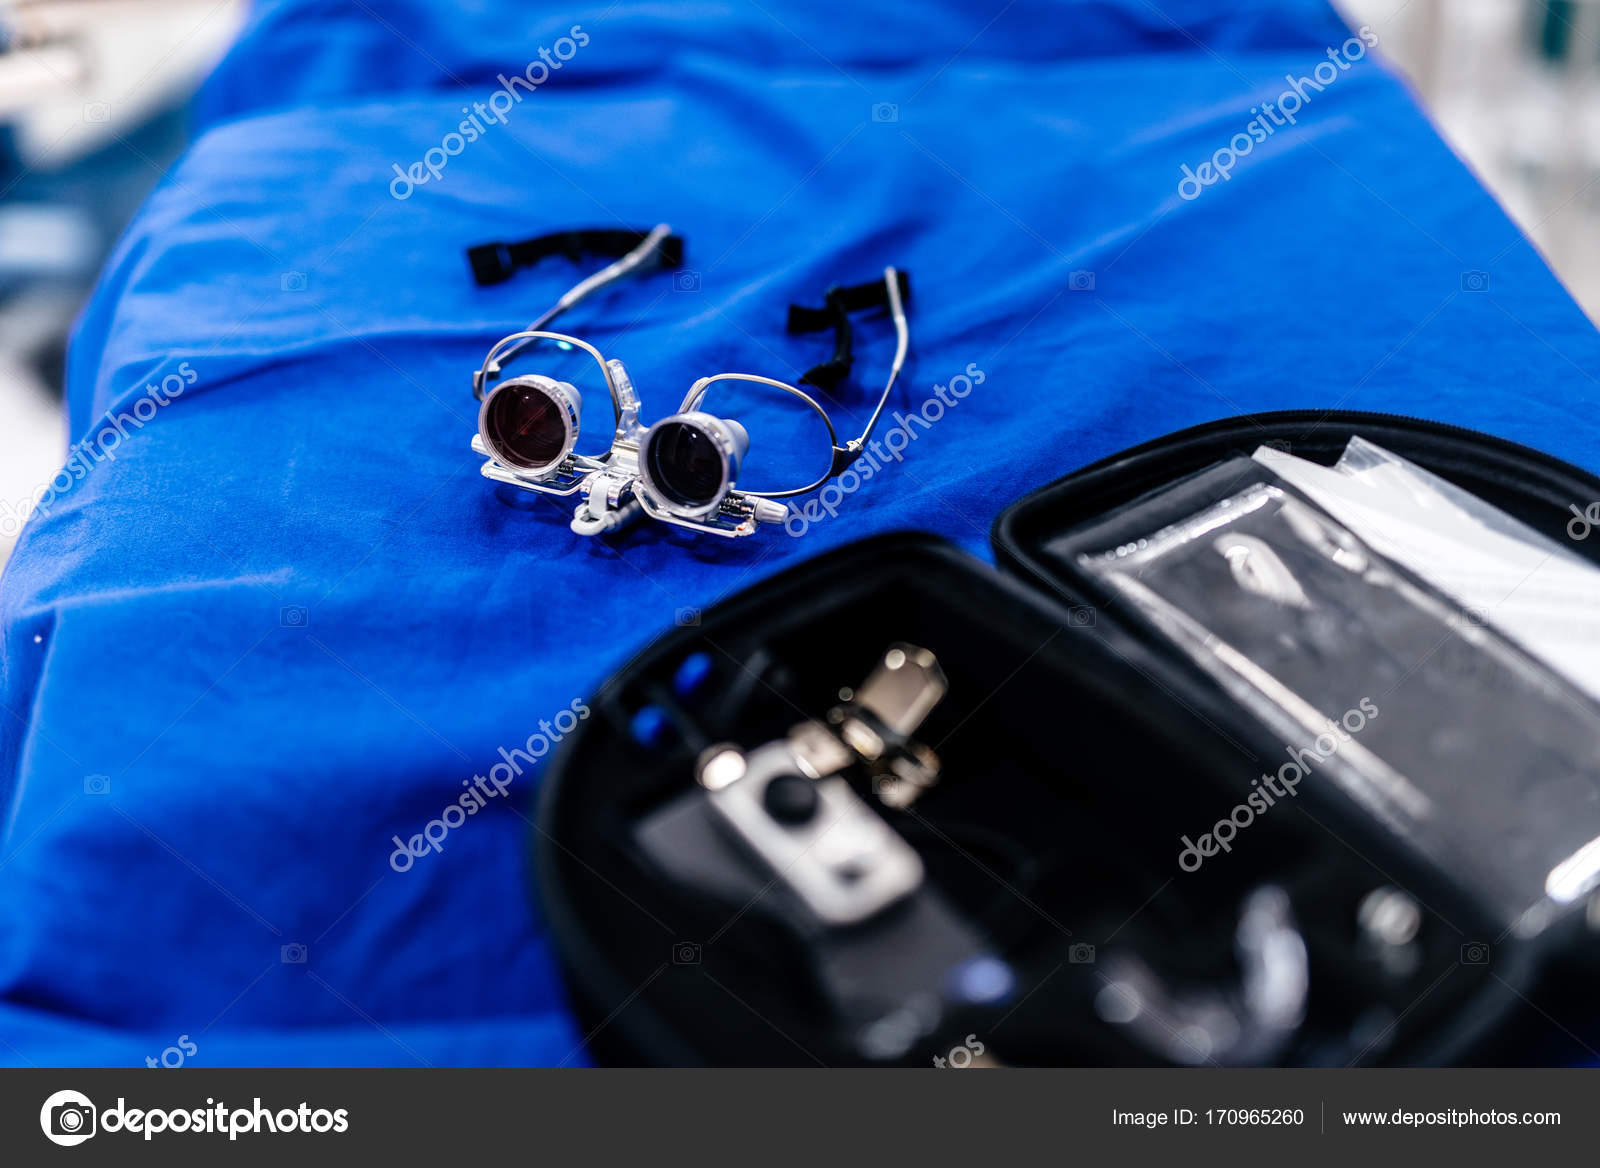 aeb38ee529 Verres-microscope du chirurgien, lunettes loupe bincoluar — Image de ...